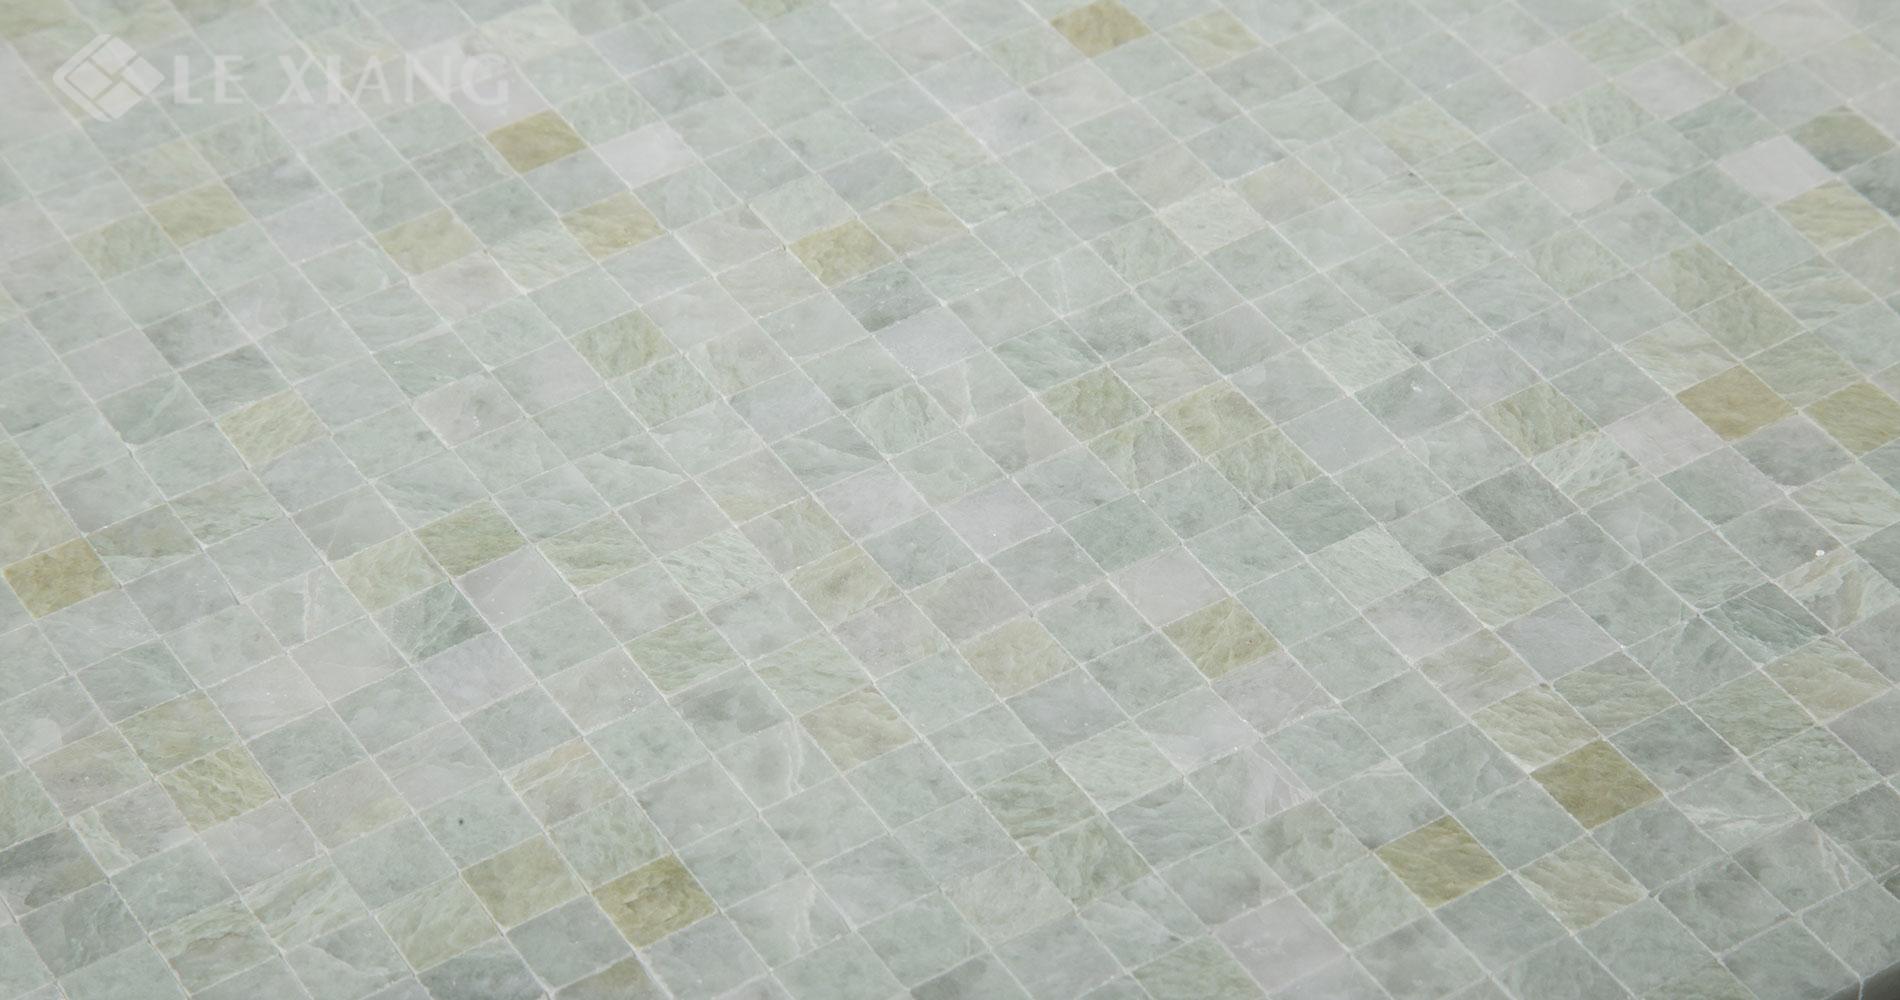 Square-Mable-Mosaic-Tiles-For-Kitchen-Backsplash-11